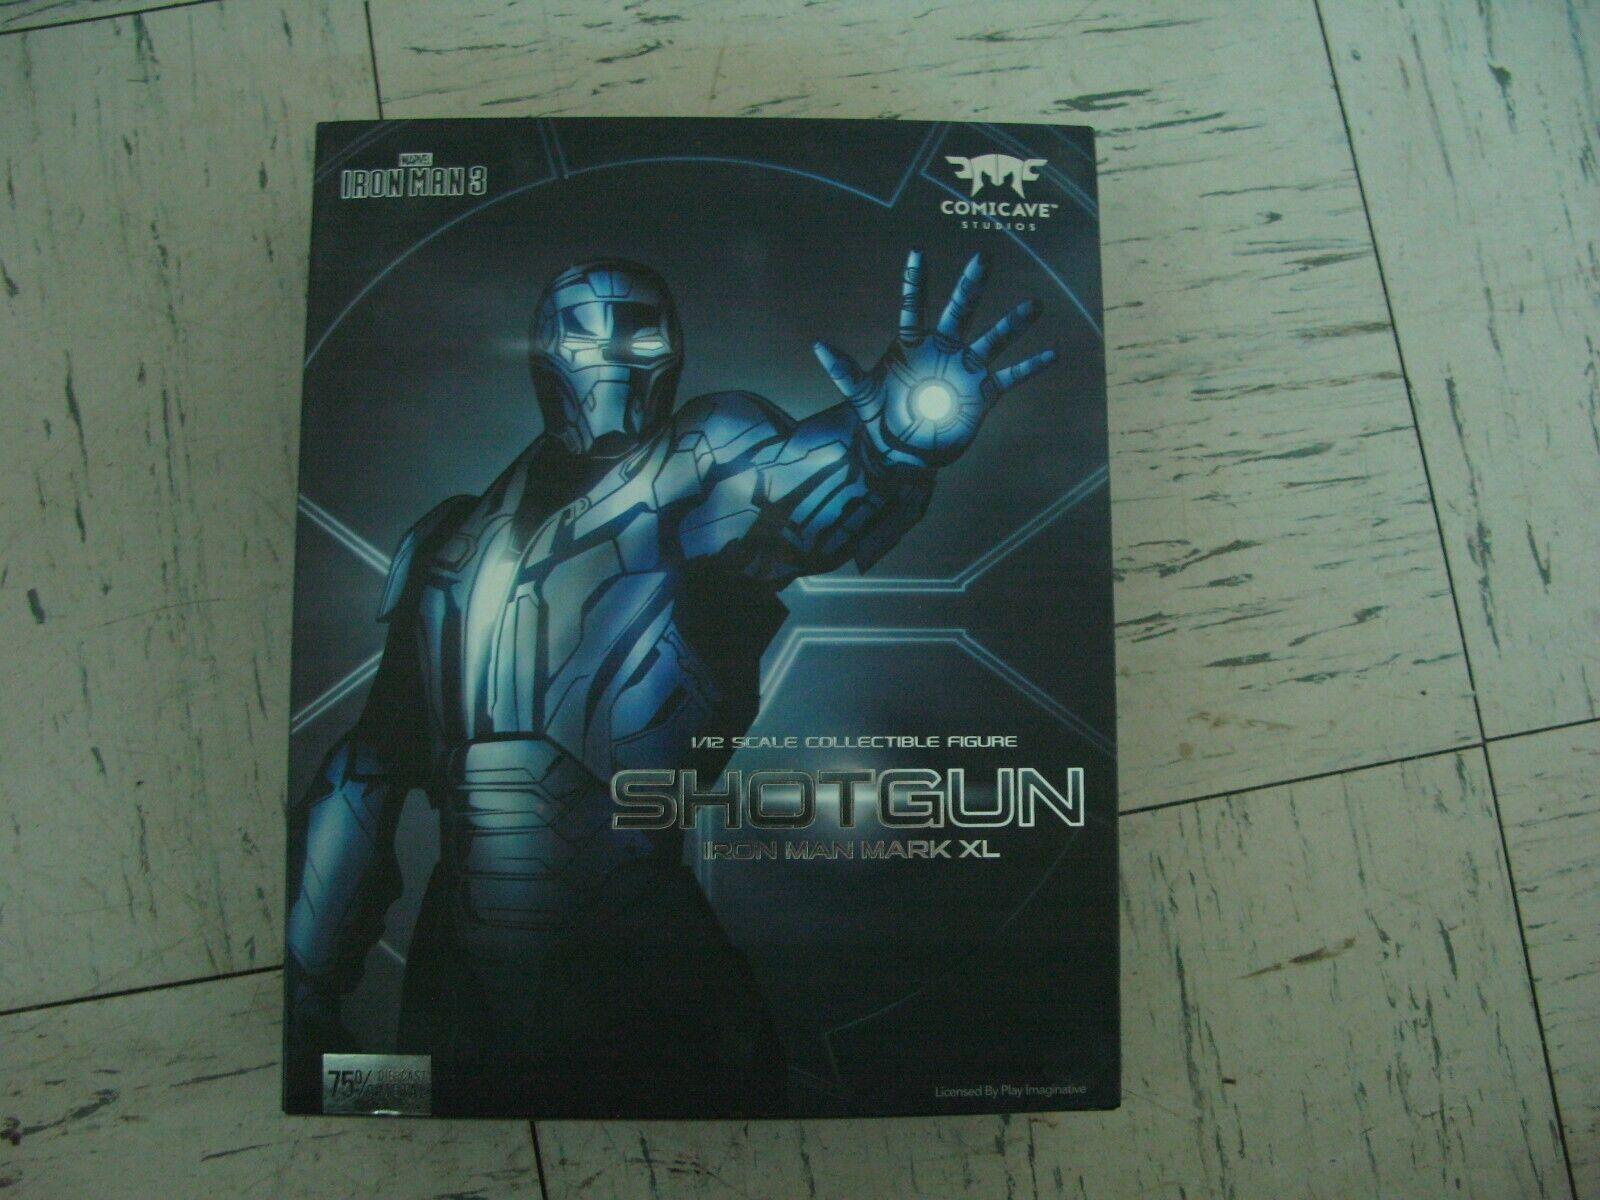 Iron Man 3 - 1 12-Scale ShotGun collectable  Figur-Comicave Studios